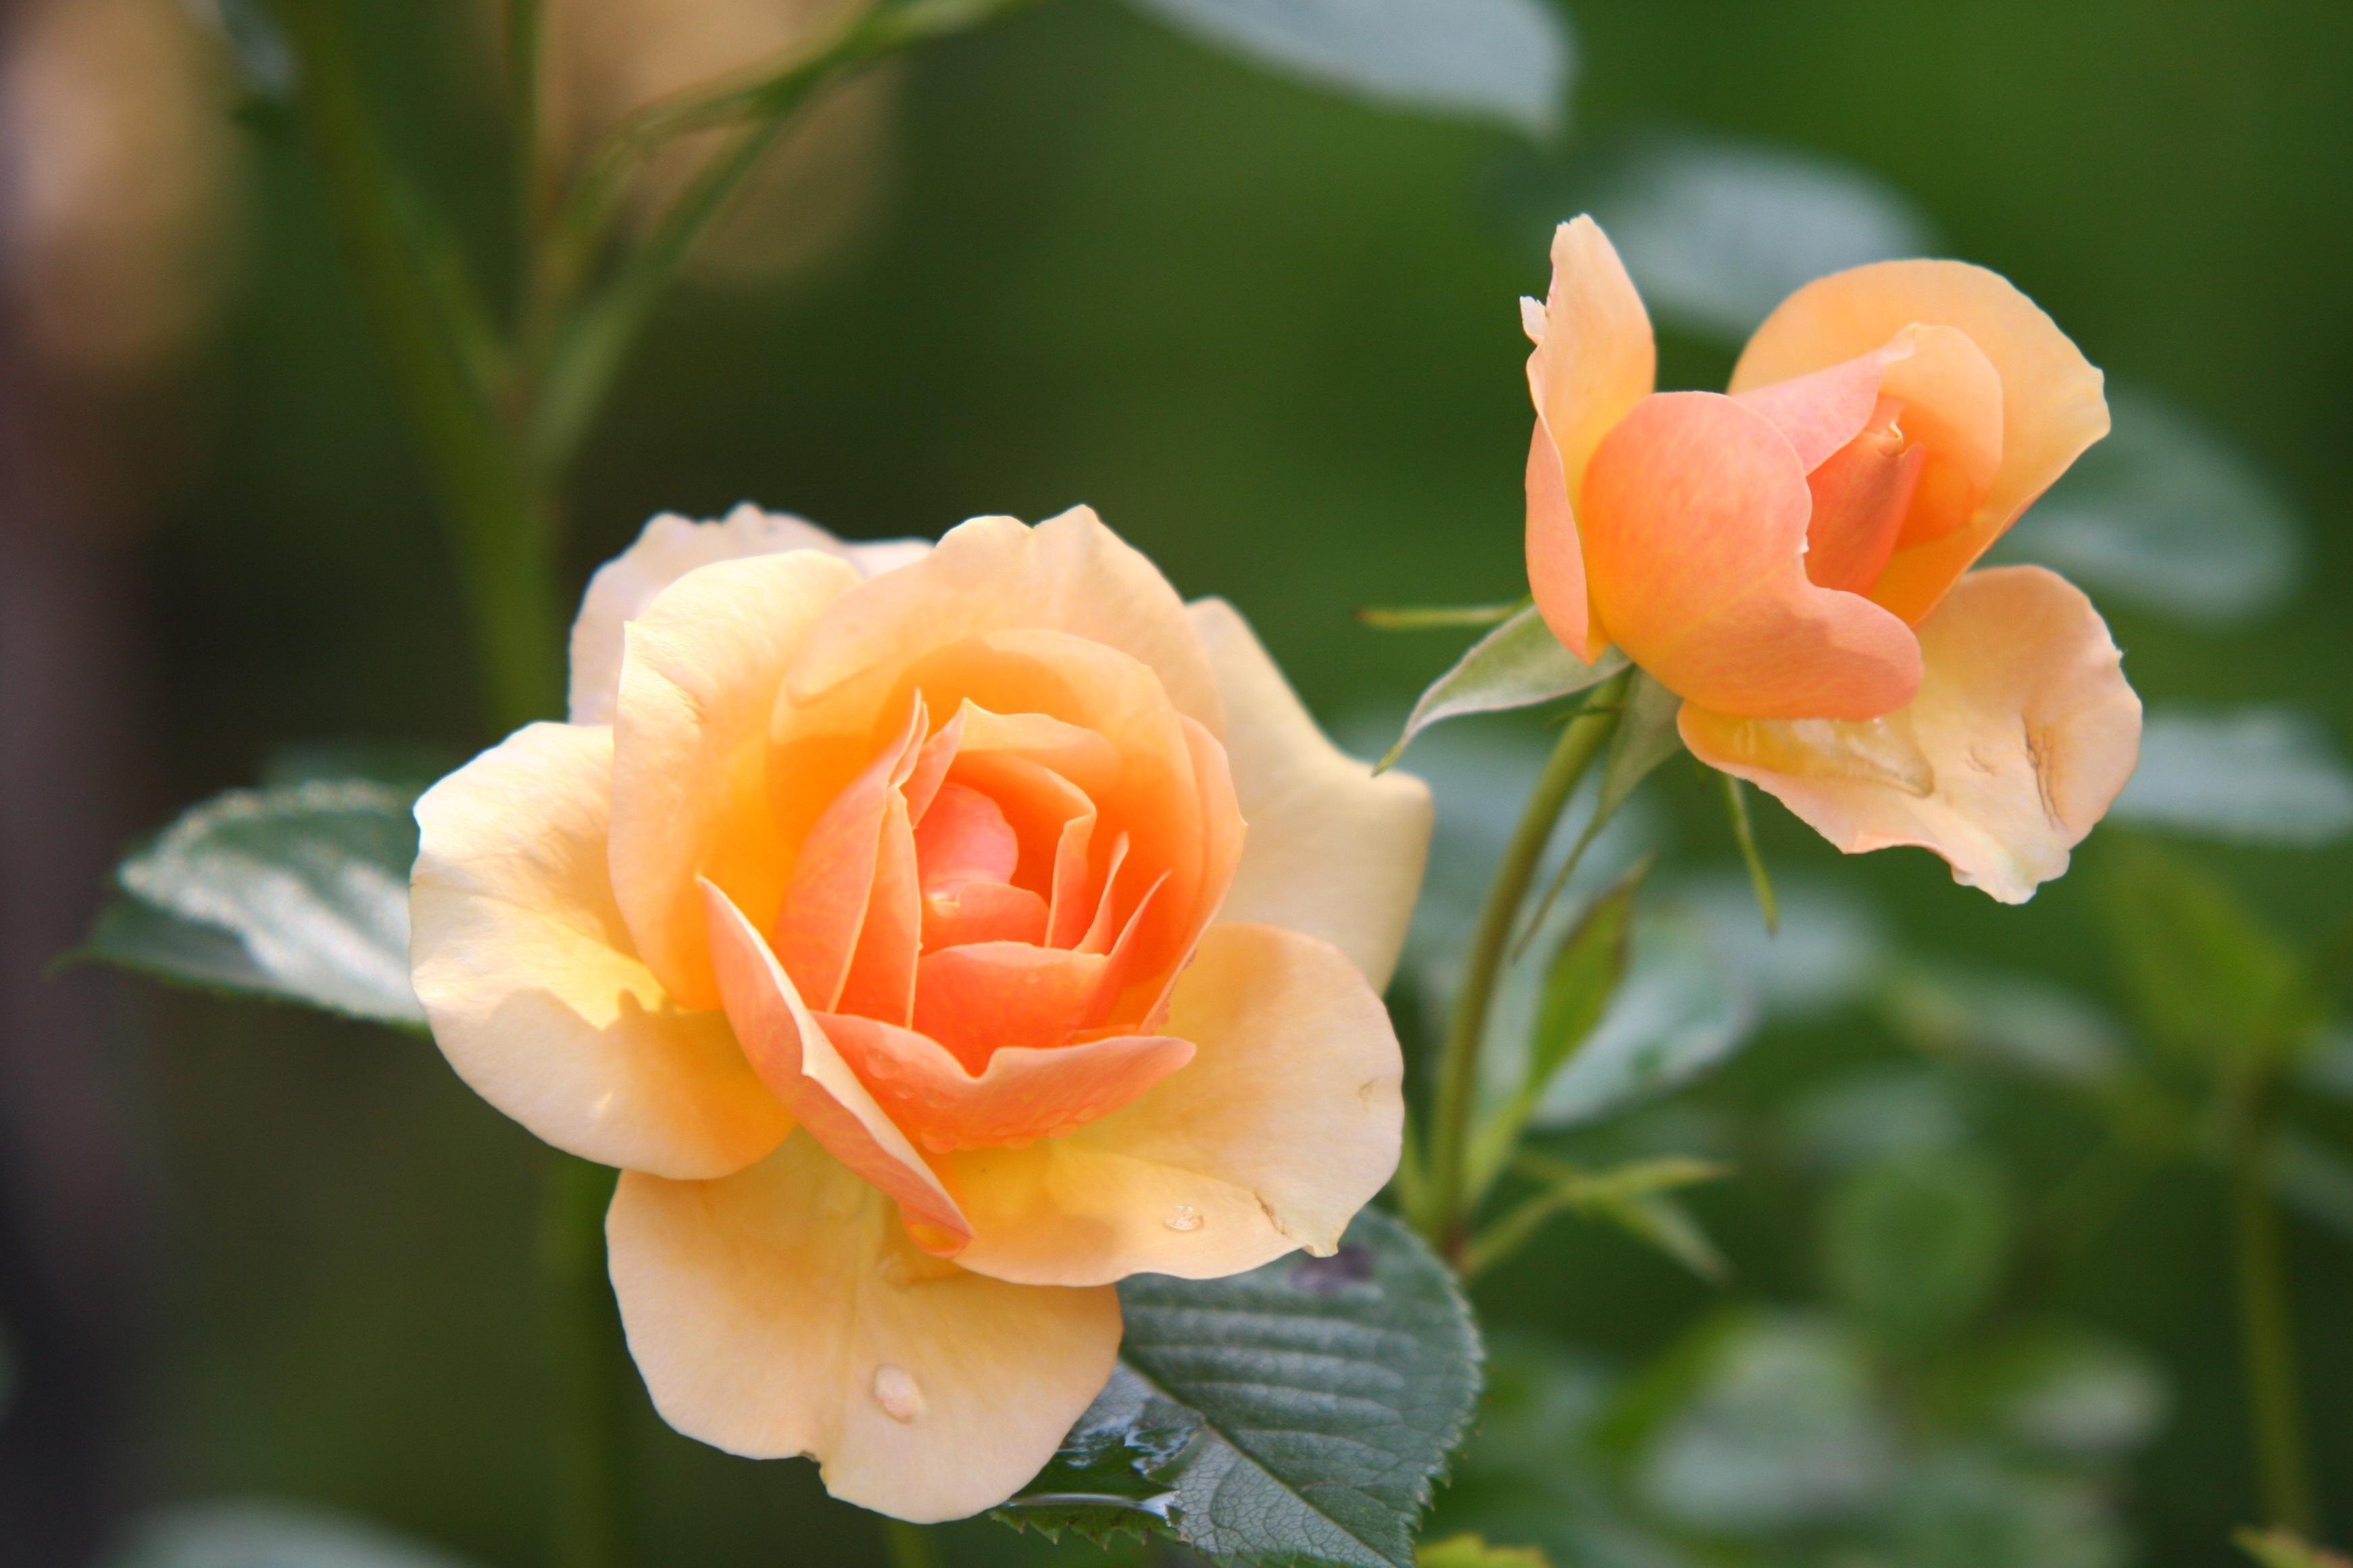 HQ Flower Wallpapers | File 1329.37Kb